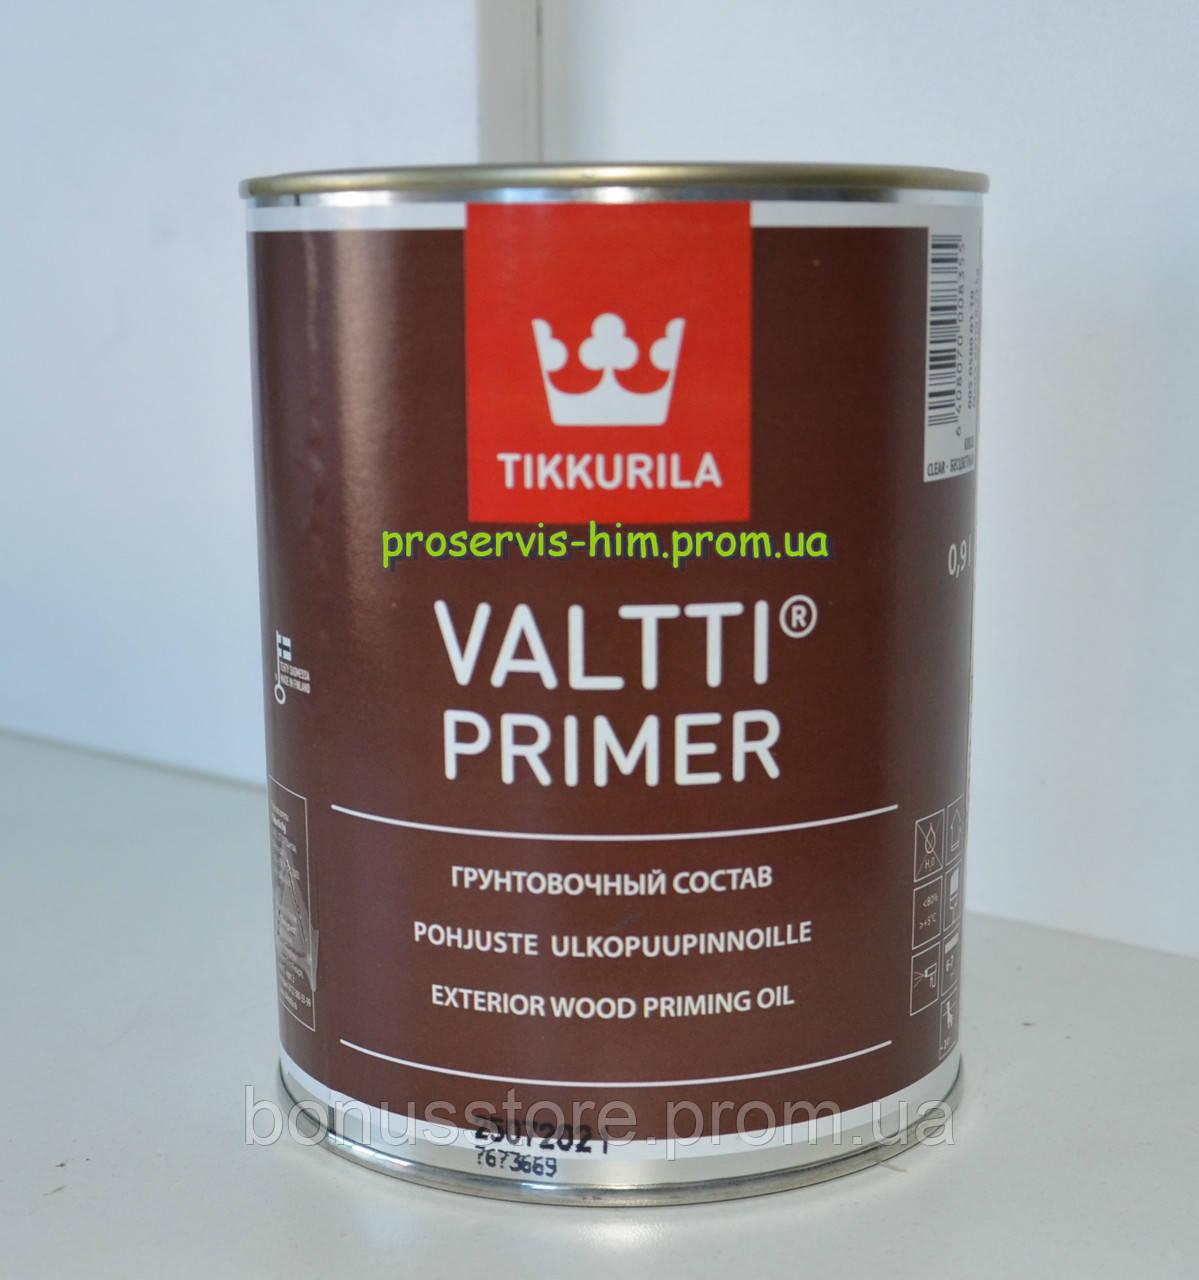 Валтти Праймер, грунтовка для дерева 0,9л Tikkurila Valtti primer - ПРОФ-ХИМ express в Виннице